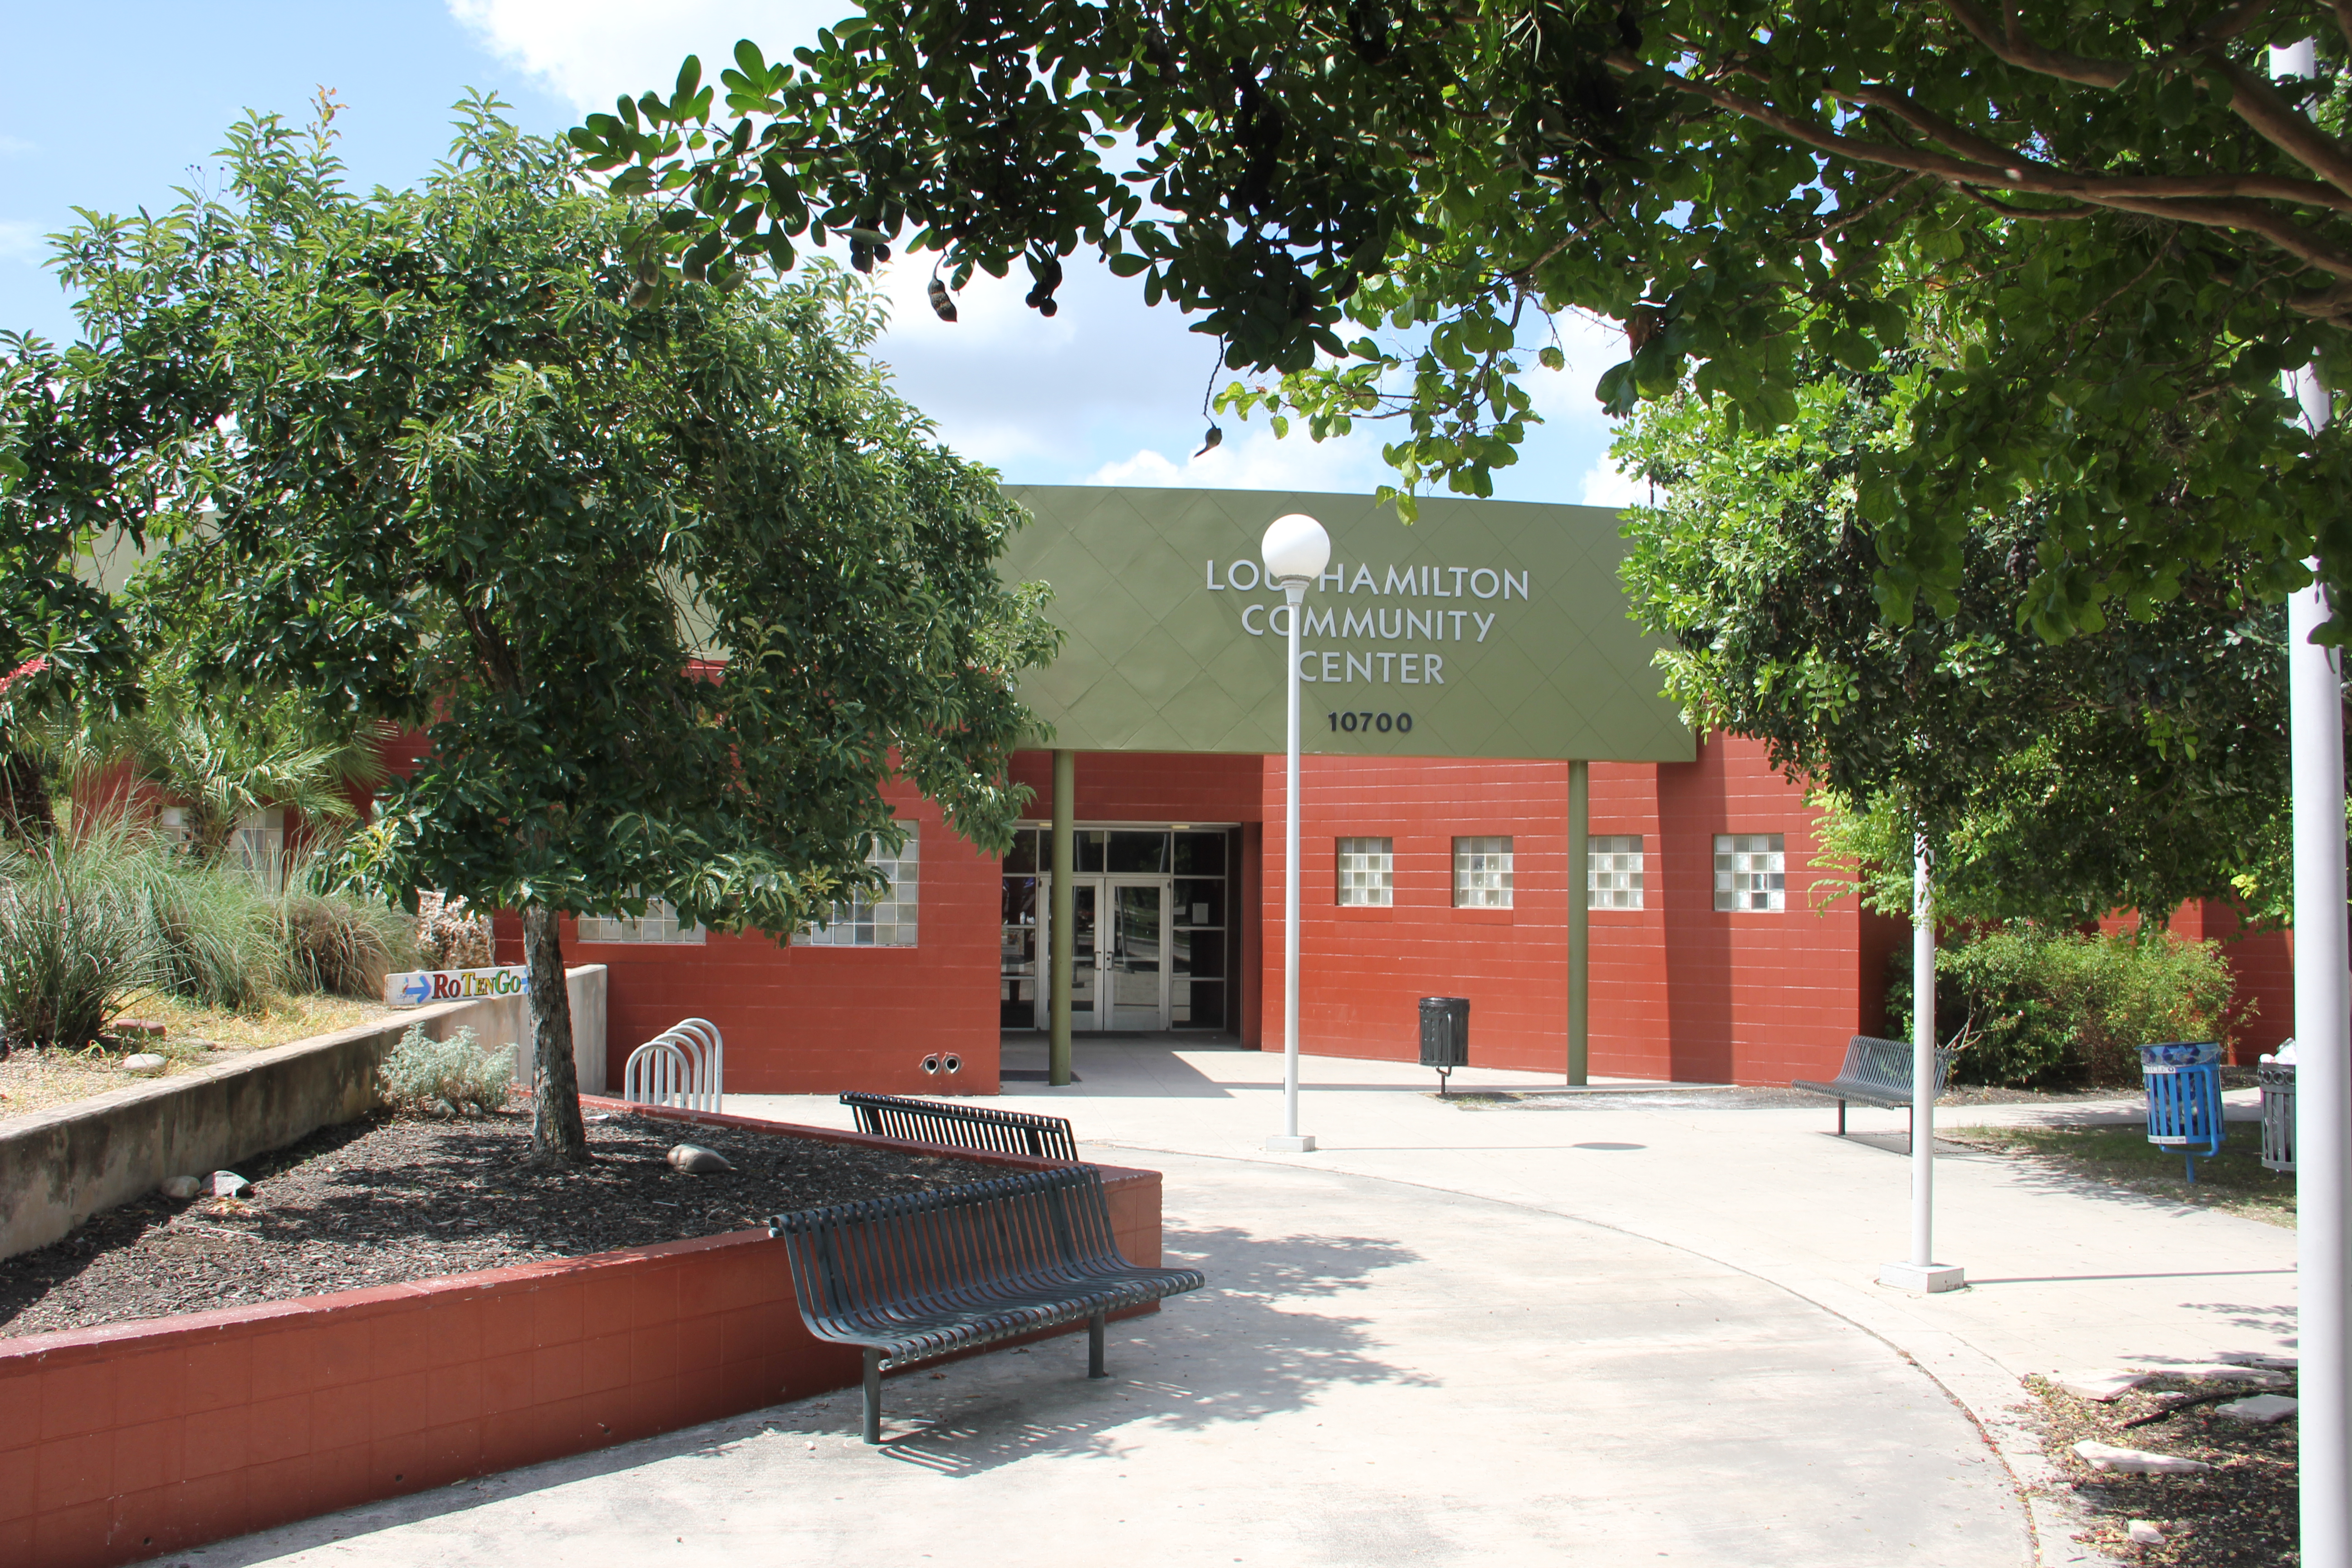 Hamilton community center the city of san antonio official city website for Hamilton swimming pool san francisco